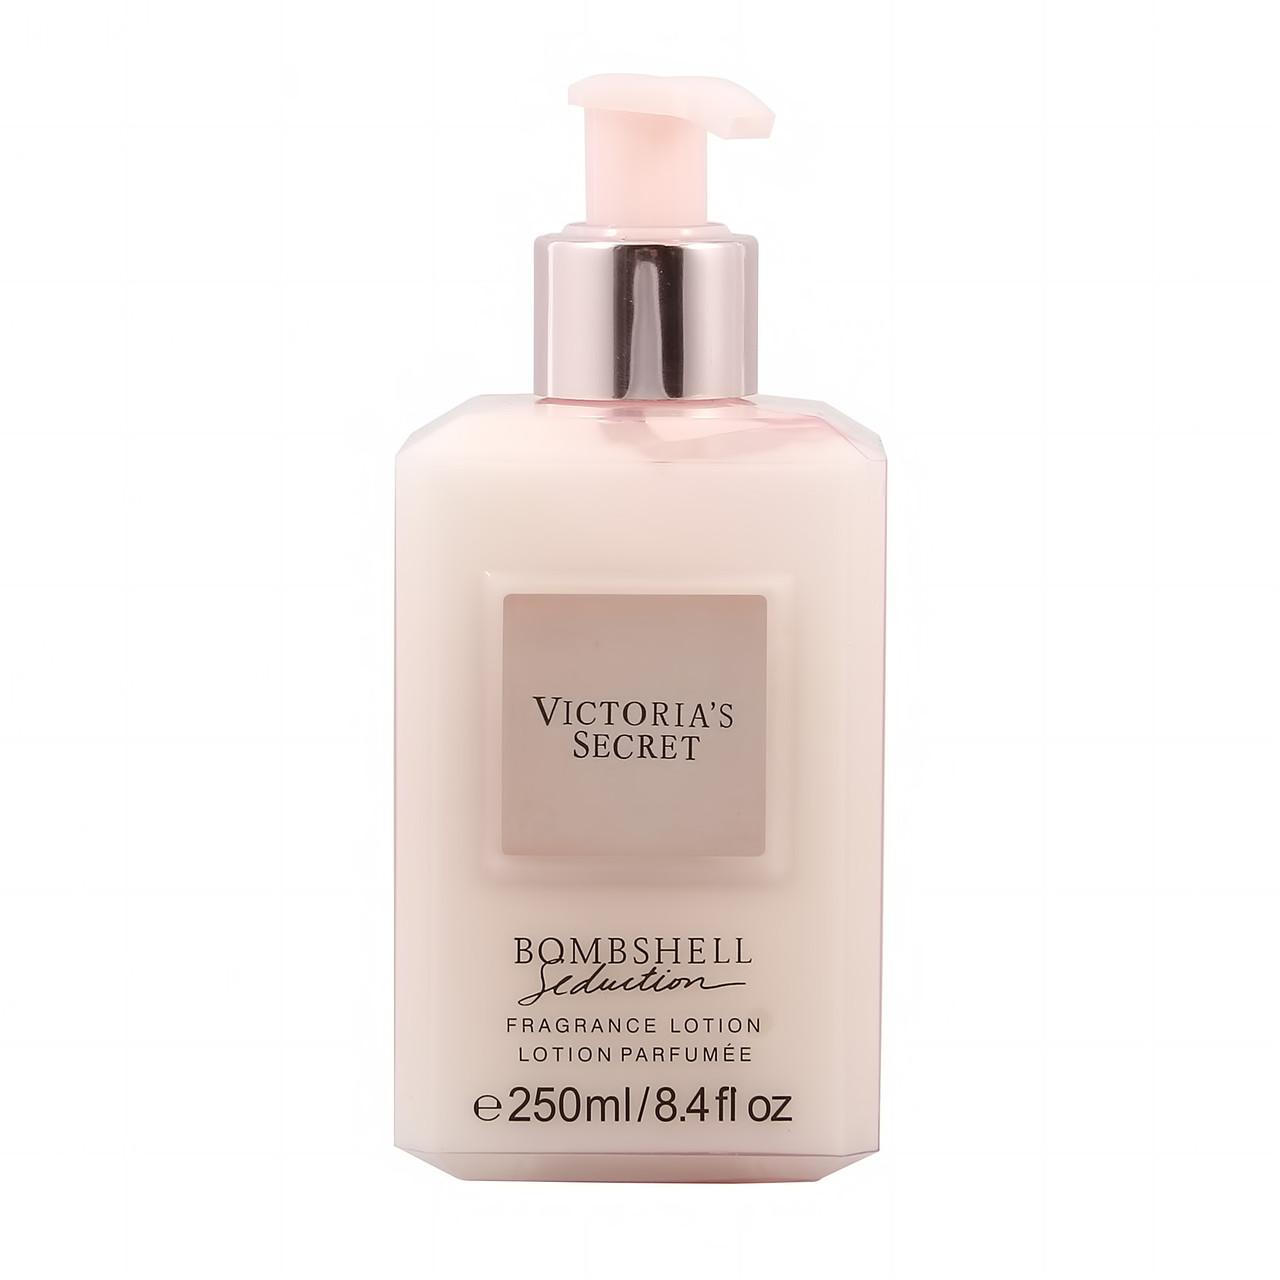 Лосьон для тела Victoria's Secret Bombshell seduction Fragrance lotion parfumee